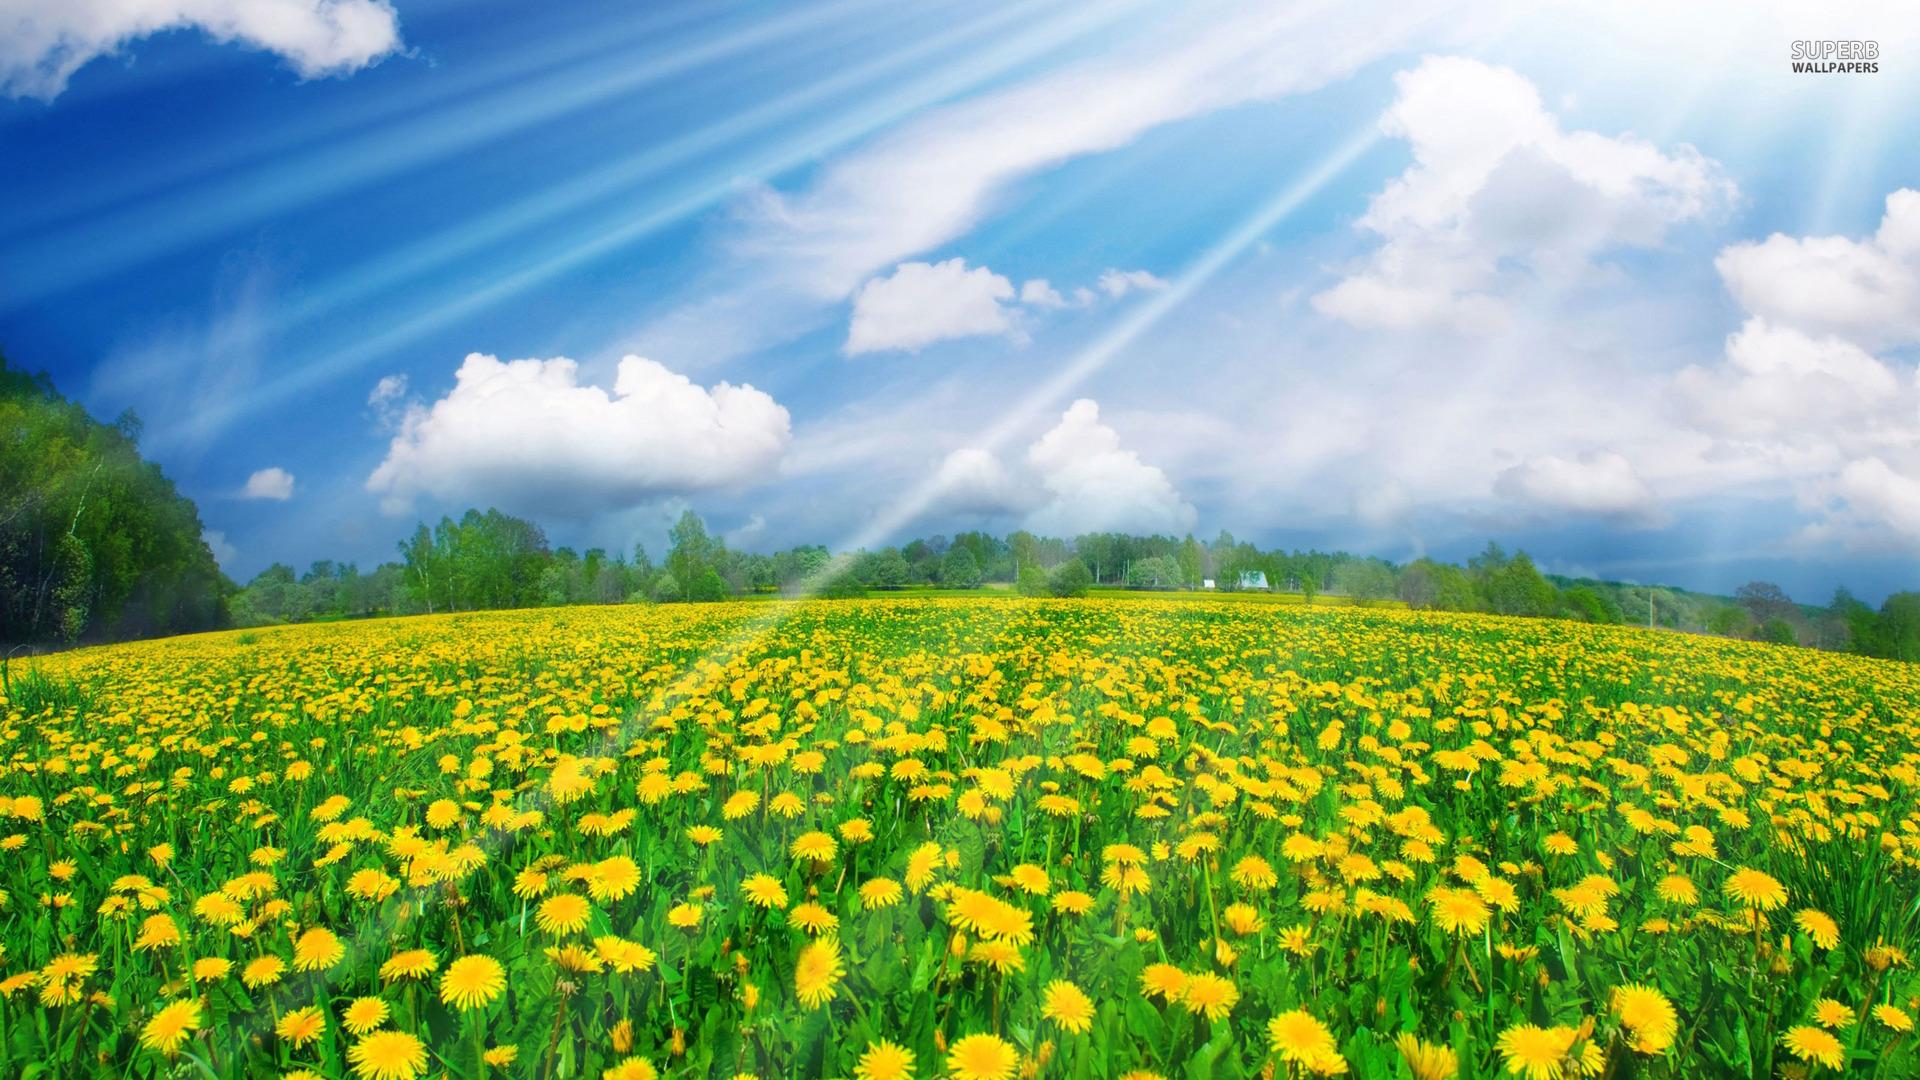 Sunshine Over Dandelion Field HD Desktop wallpaper, images and photos